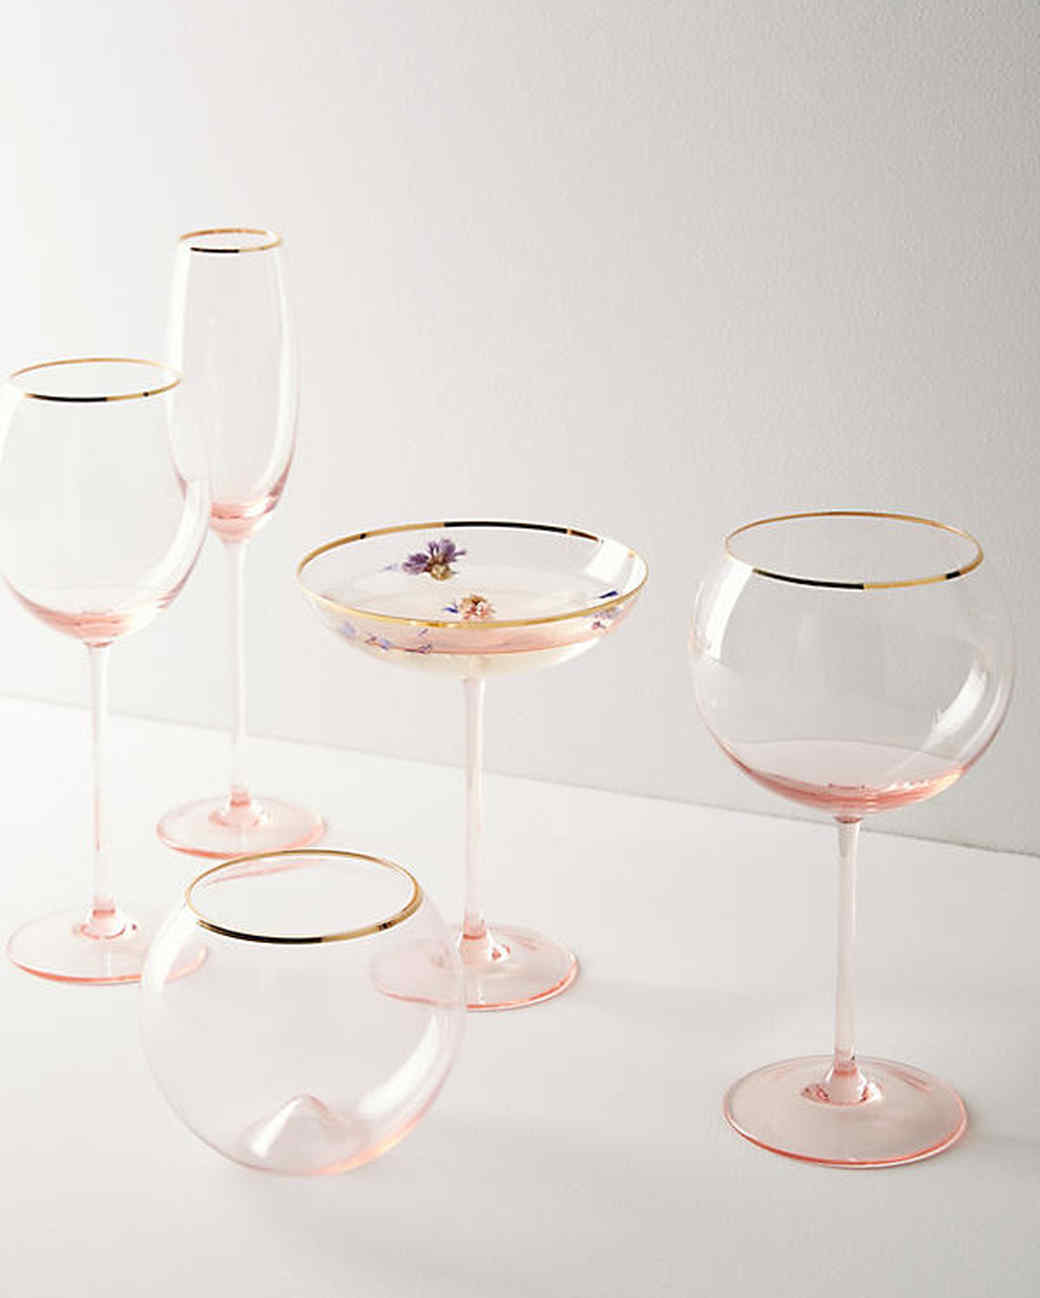 gilded rim glassware